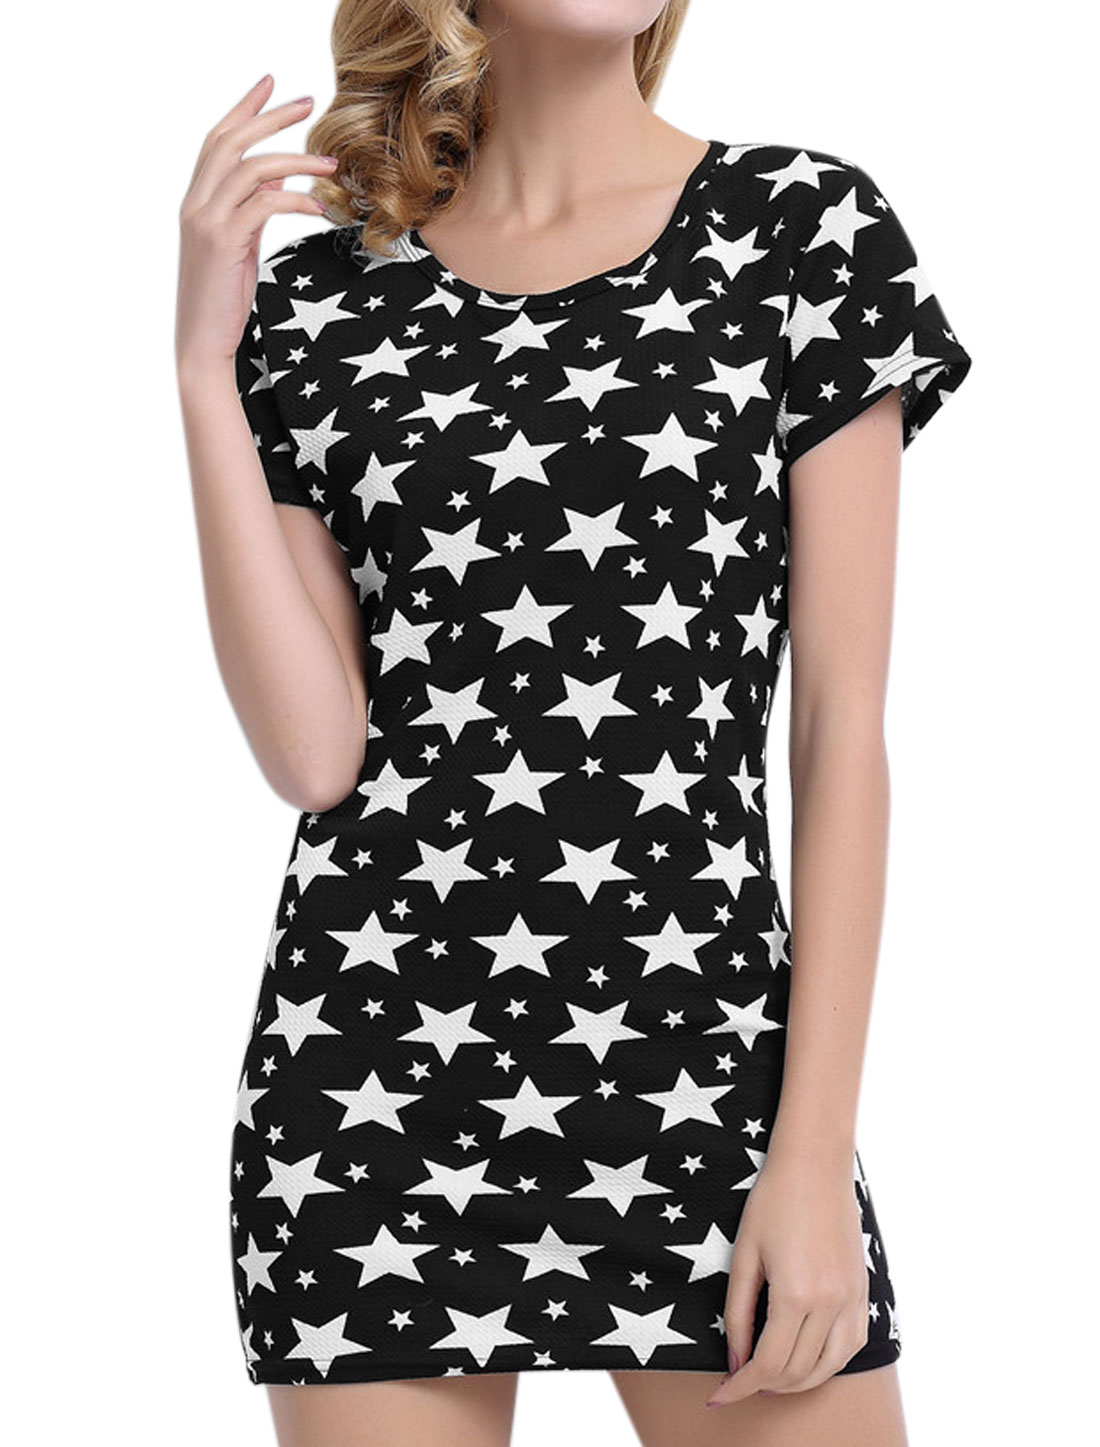 Women Short Sleeves Round Neck Stars Print Sheath Dress Black M